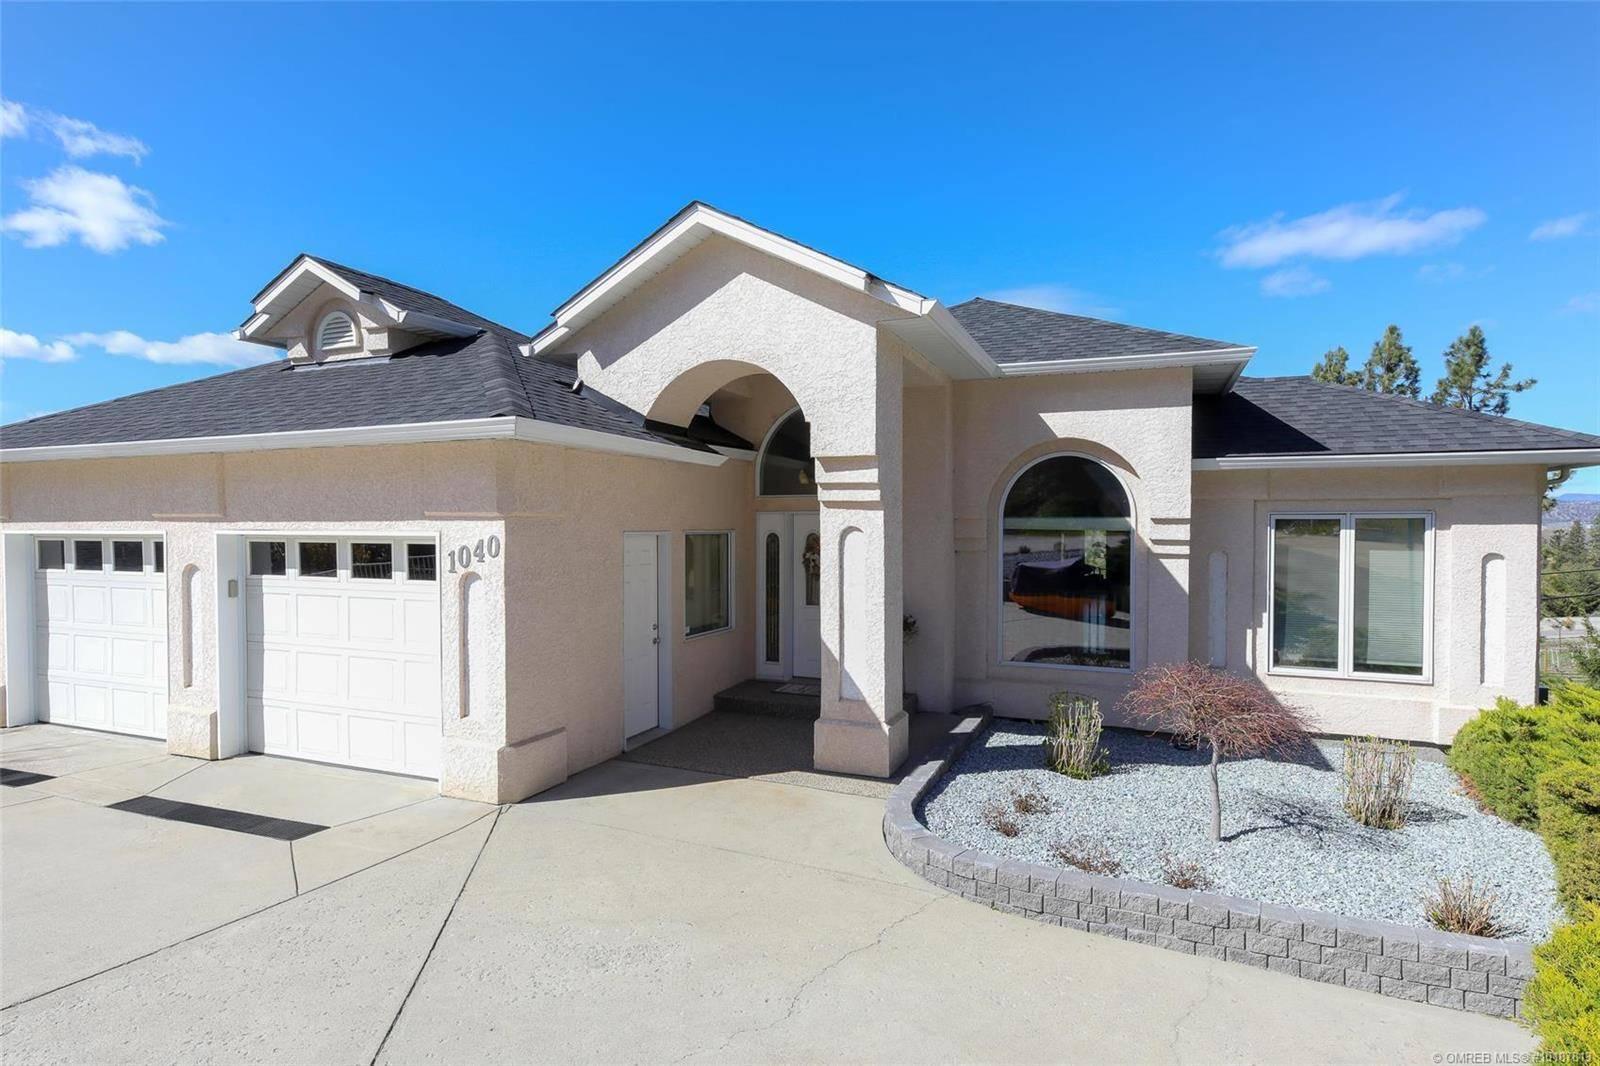 House for sale at 1040 Bartholomew Ct Kelowna British Columbia - MLS: 10187813